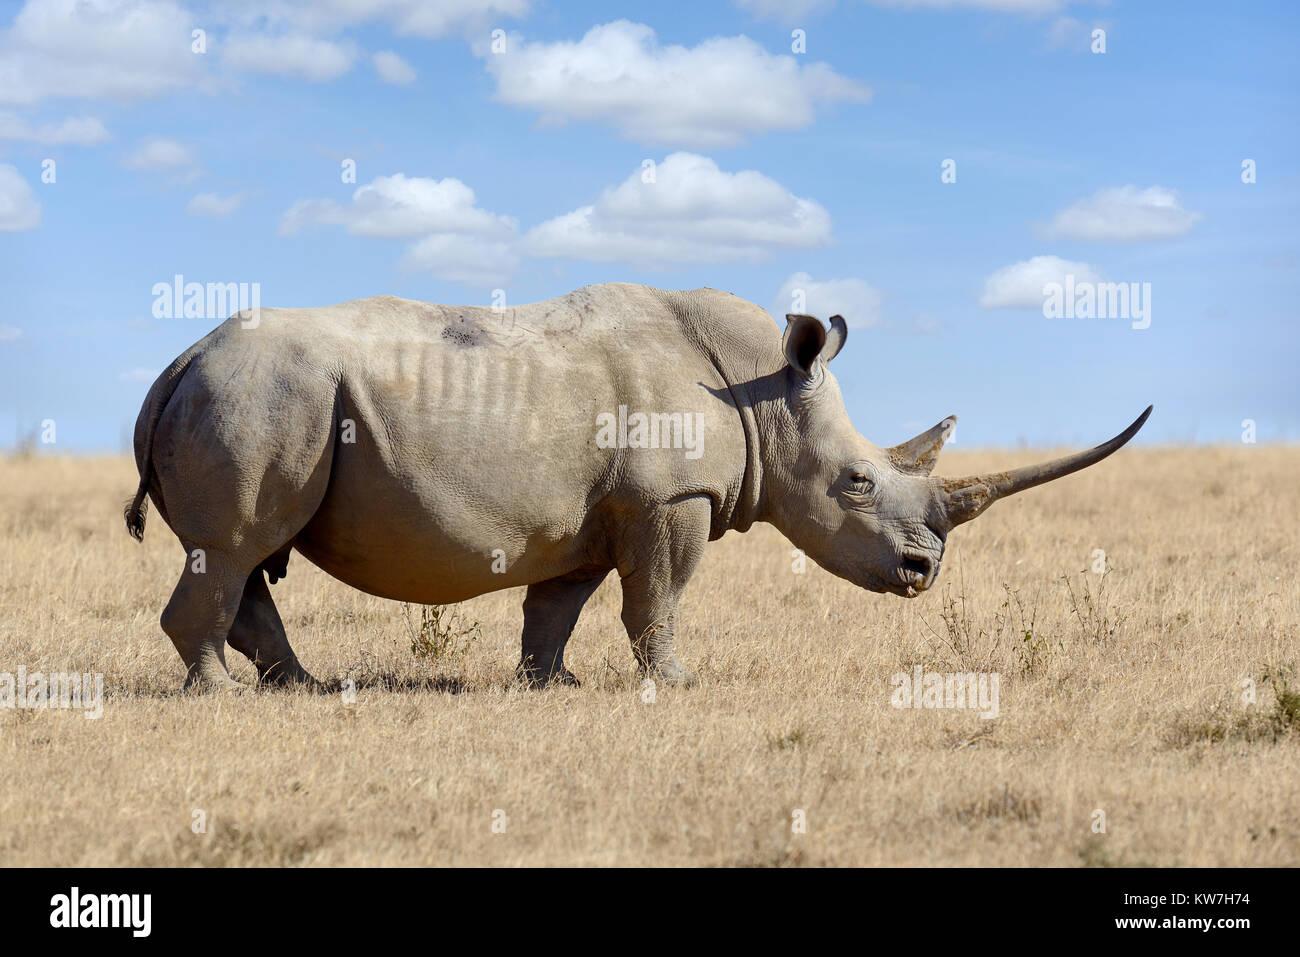 African white rhino, National park of Kenya, Africa - Stock Image